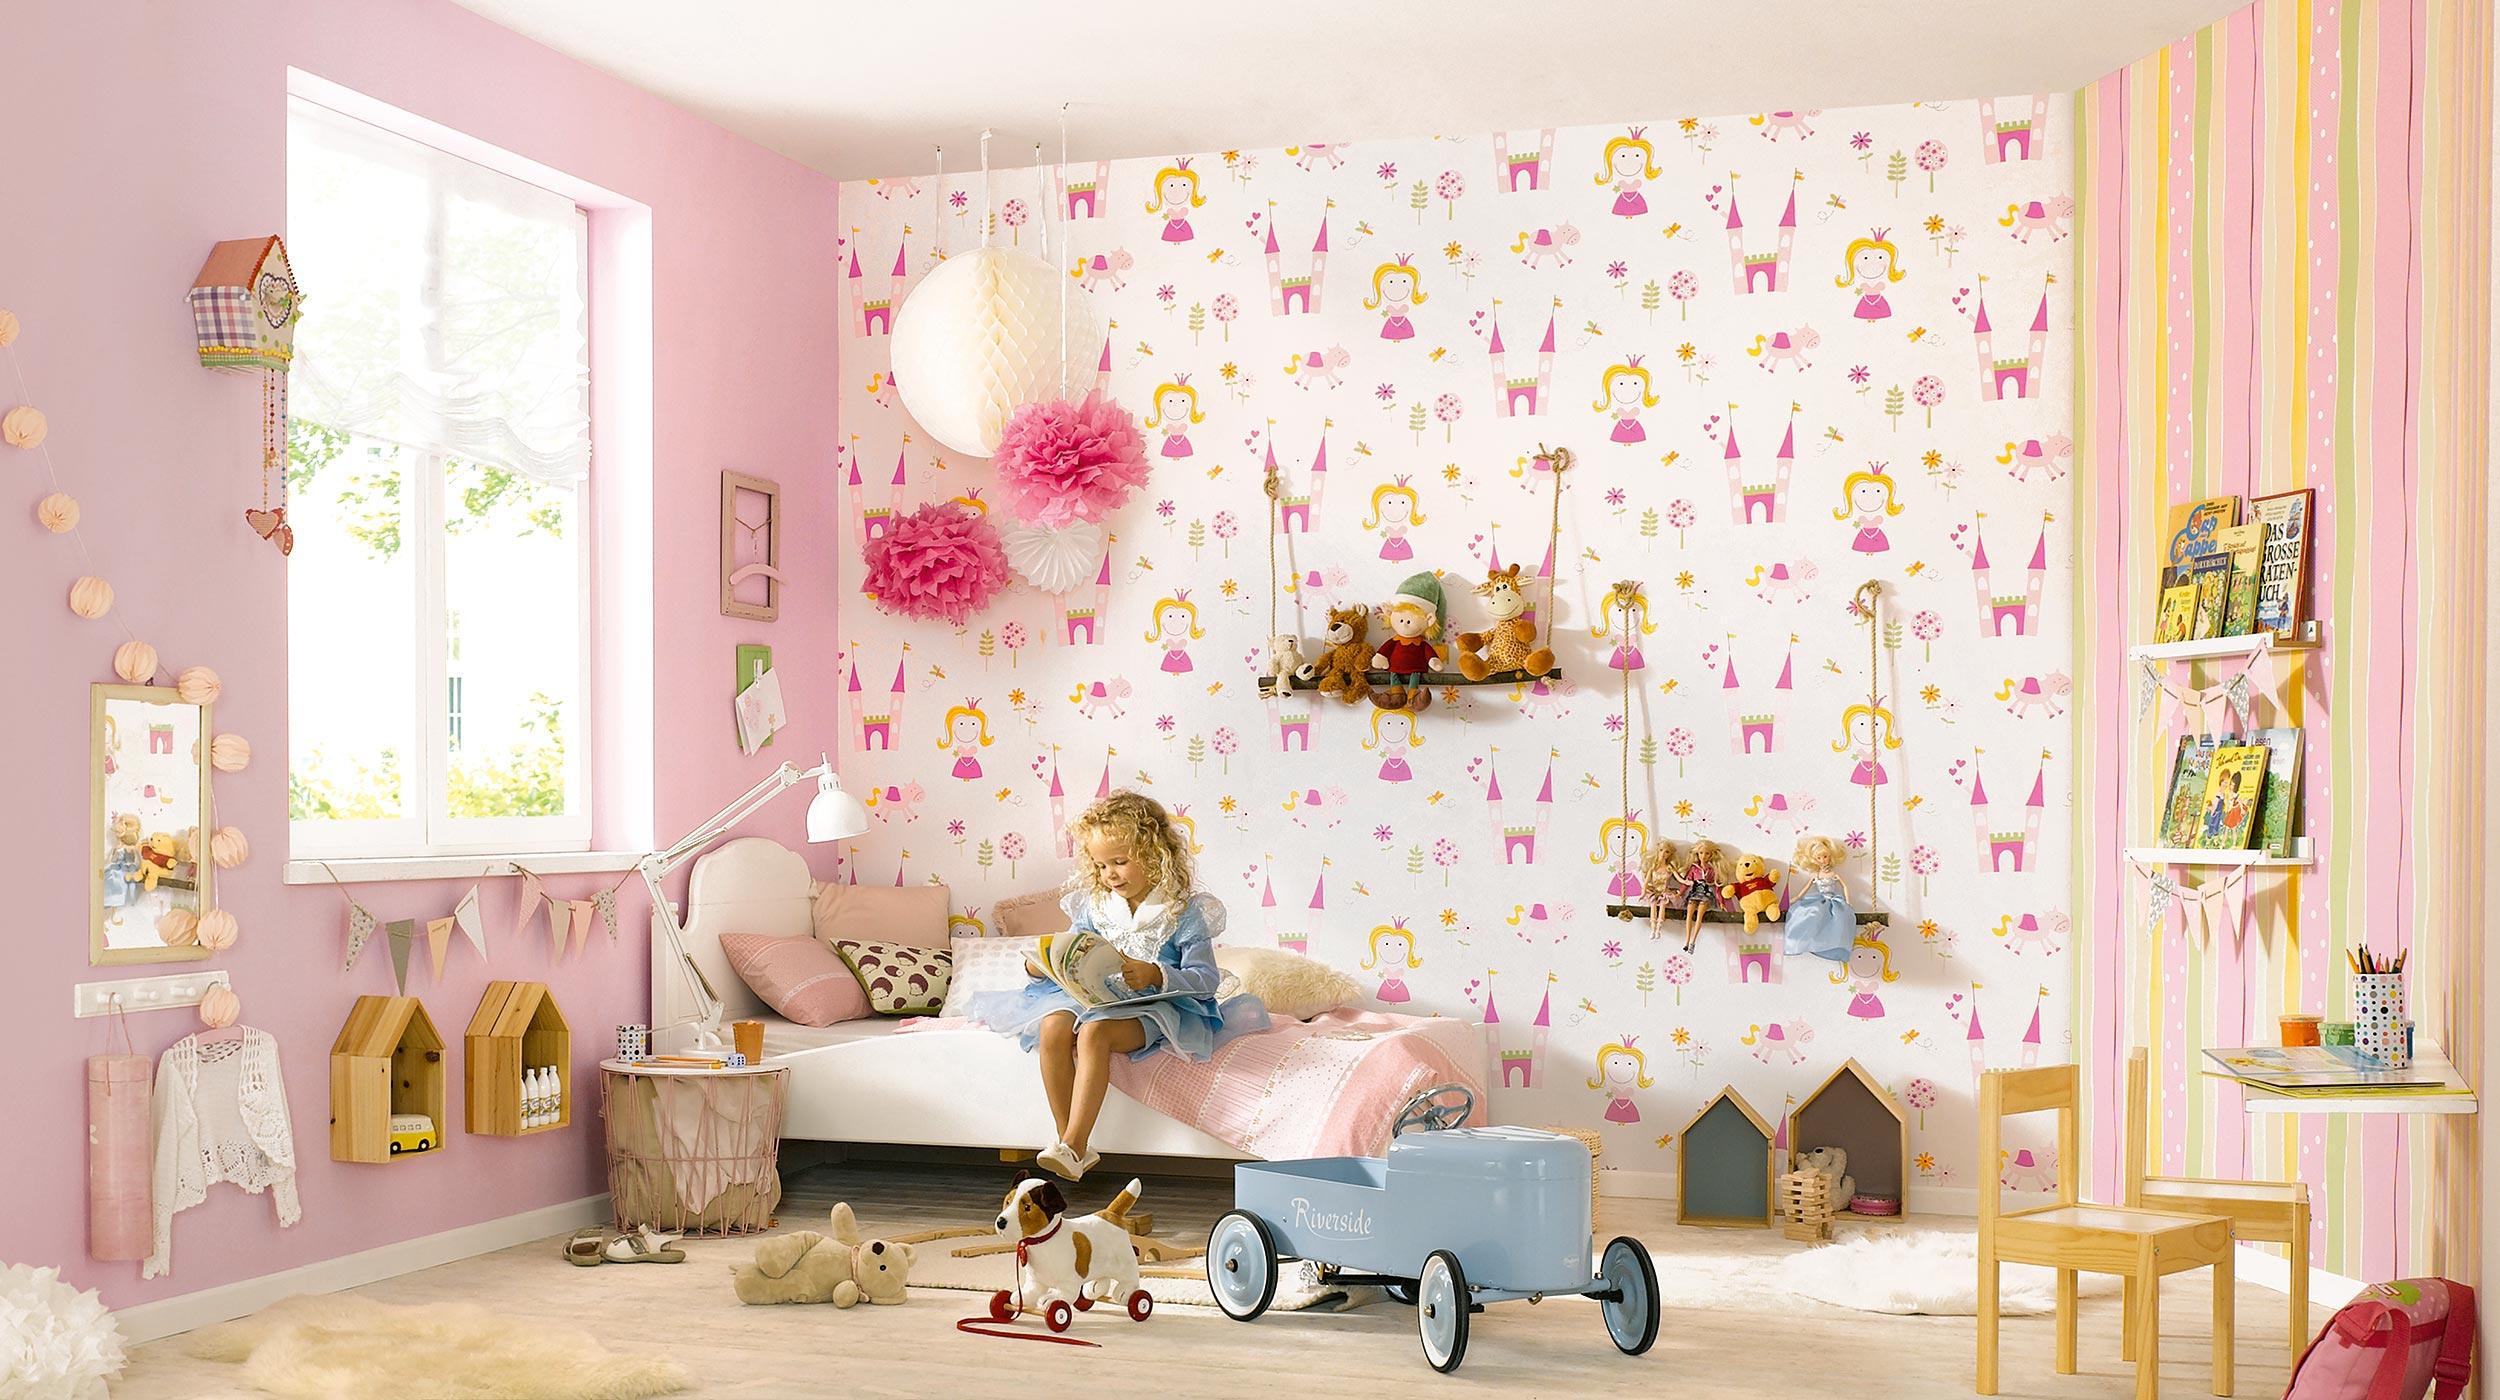 Kinderzimmer Tapeten | Kinderzimmertapeten Kinderzimmertapeten Lotta Erismann Cie Gmbh